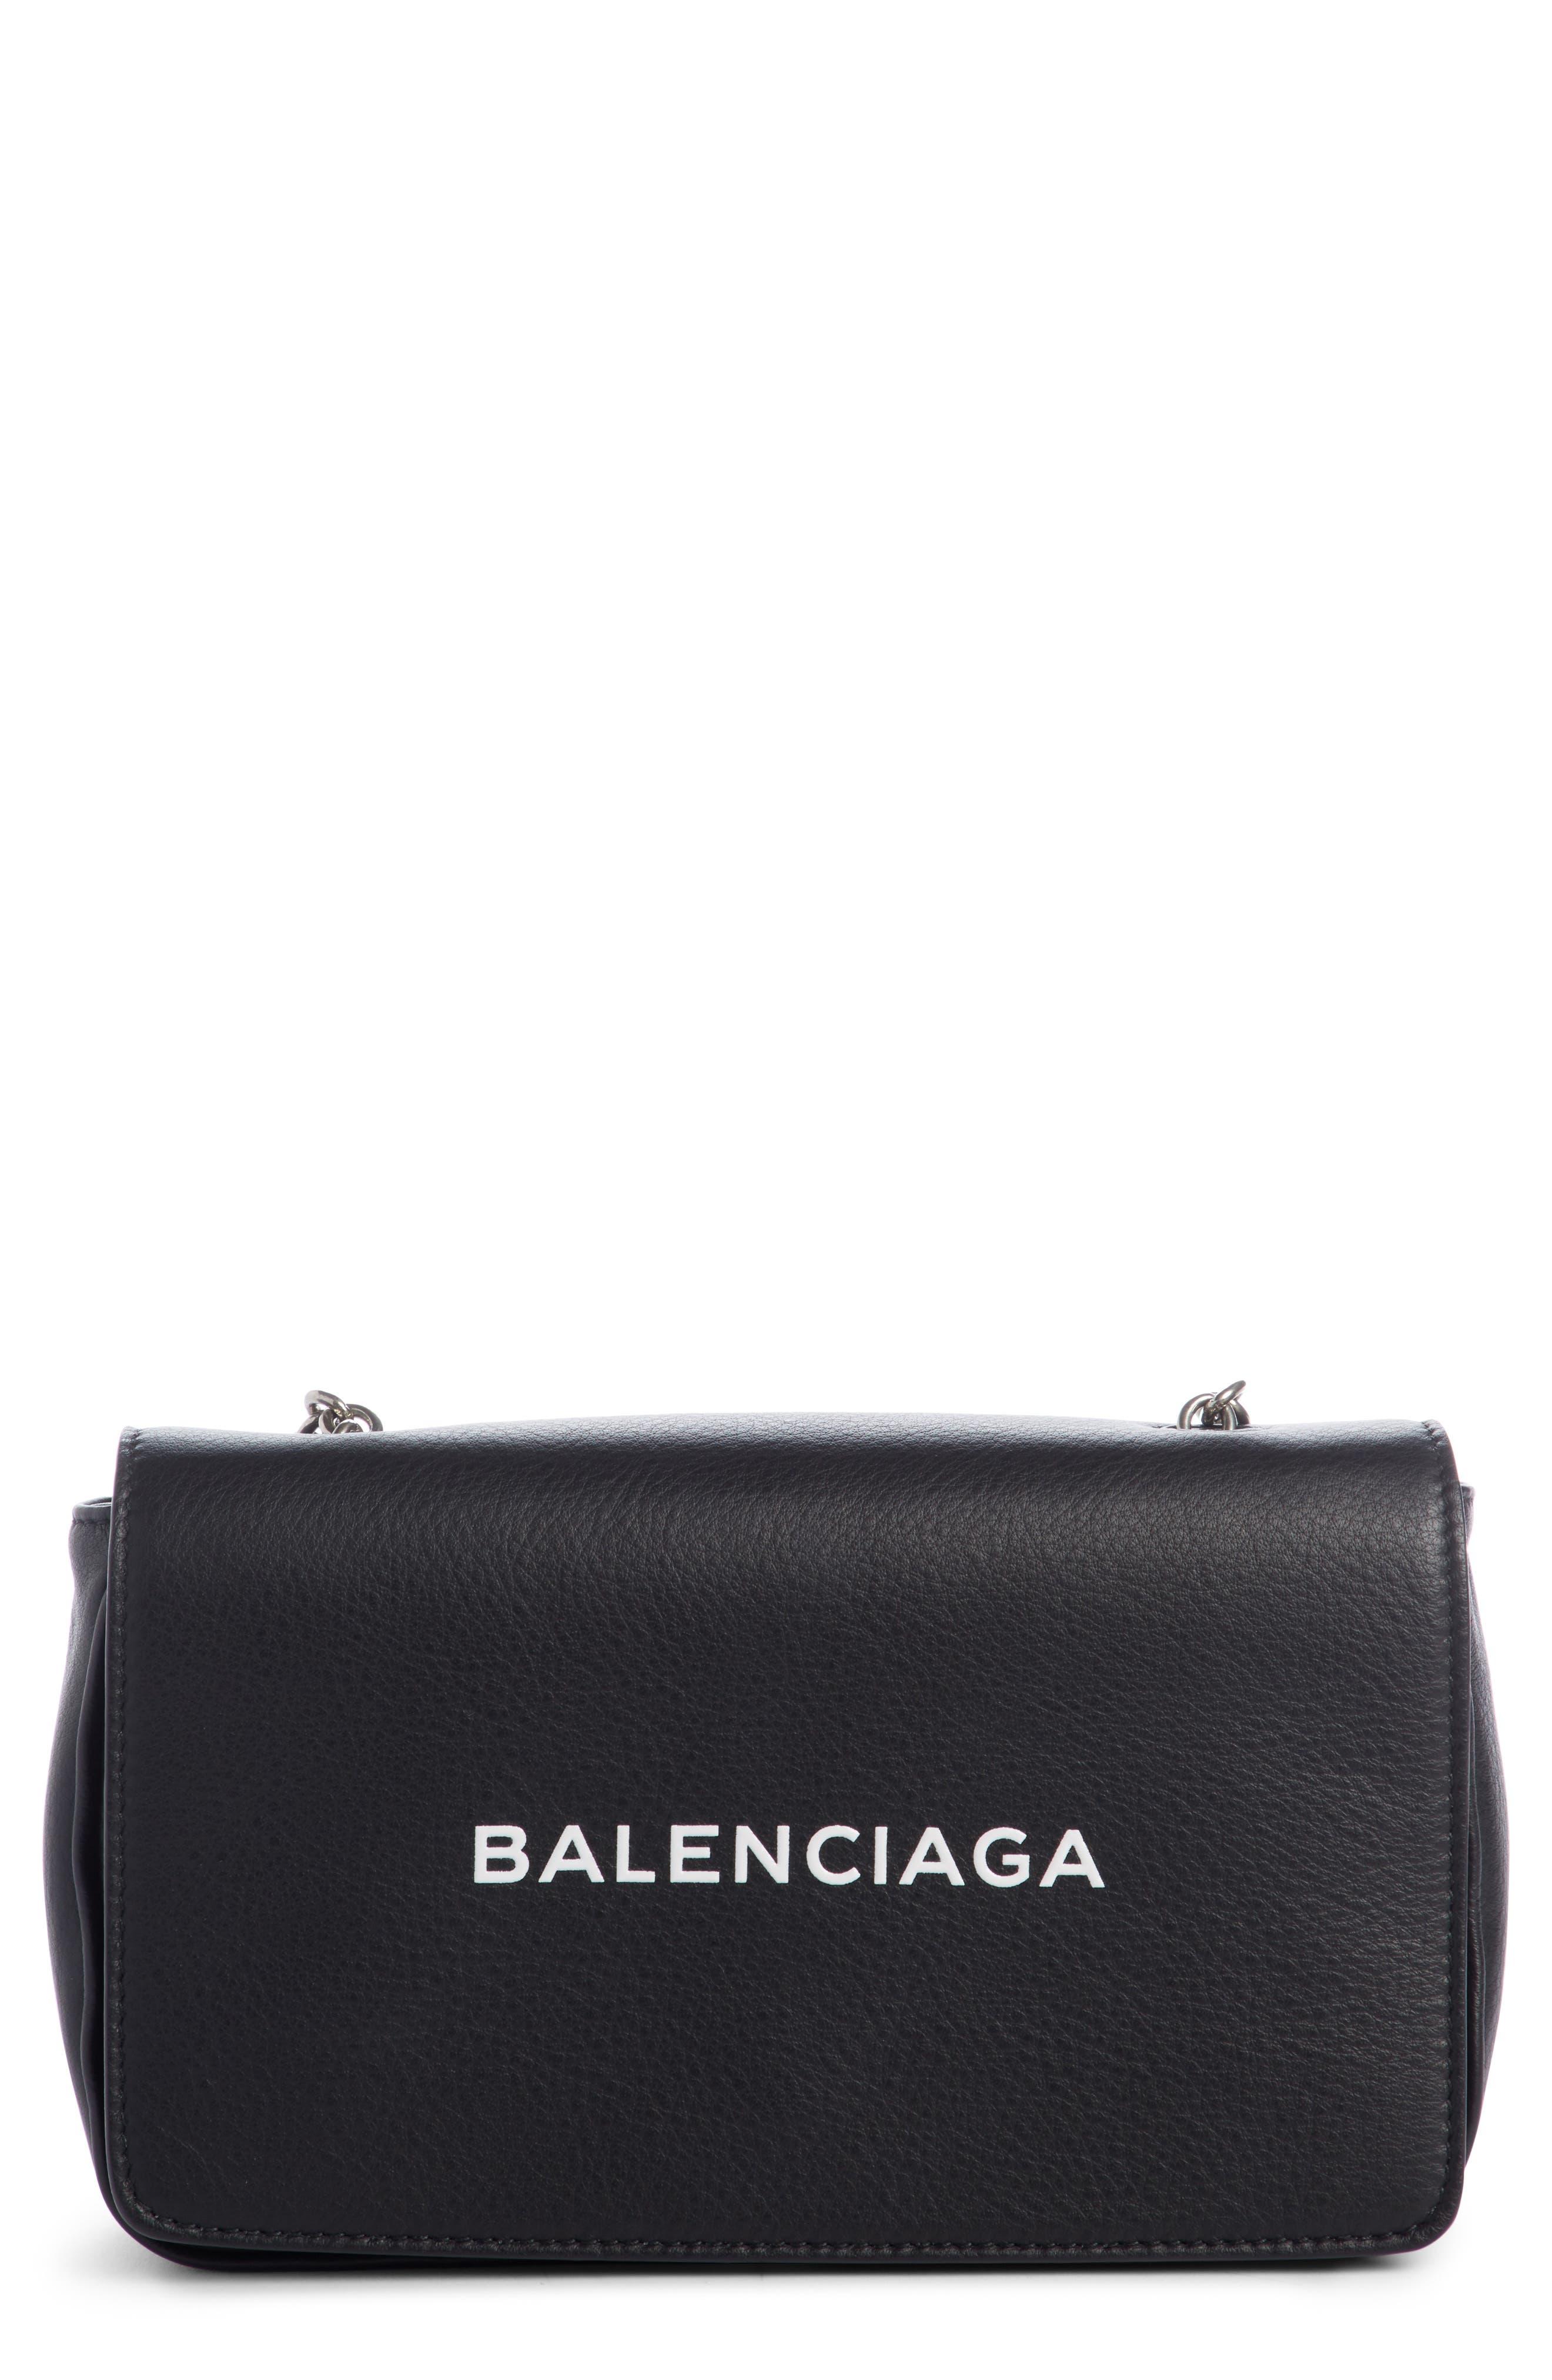 Main Image - Balenciaga Everyday Calfskin Wallet on a Chain